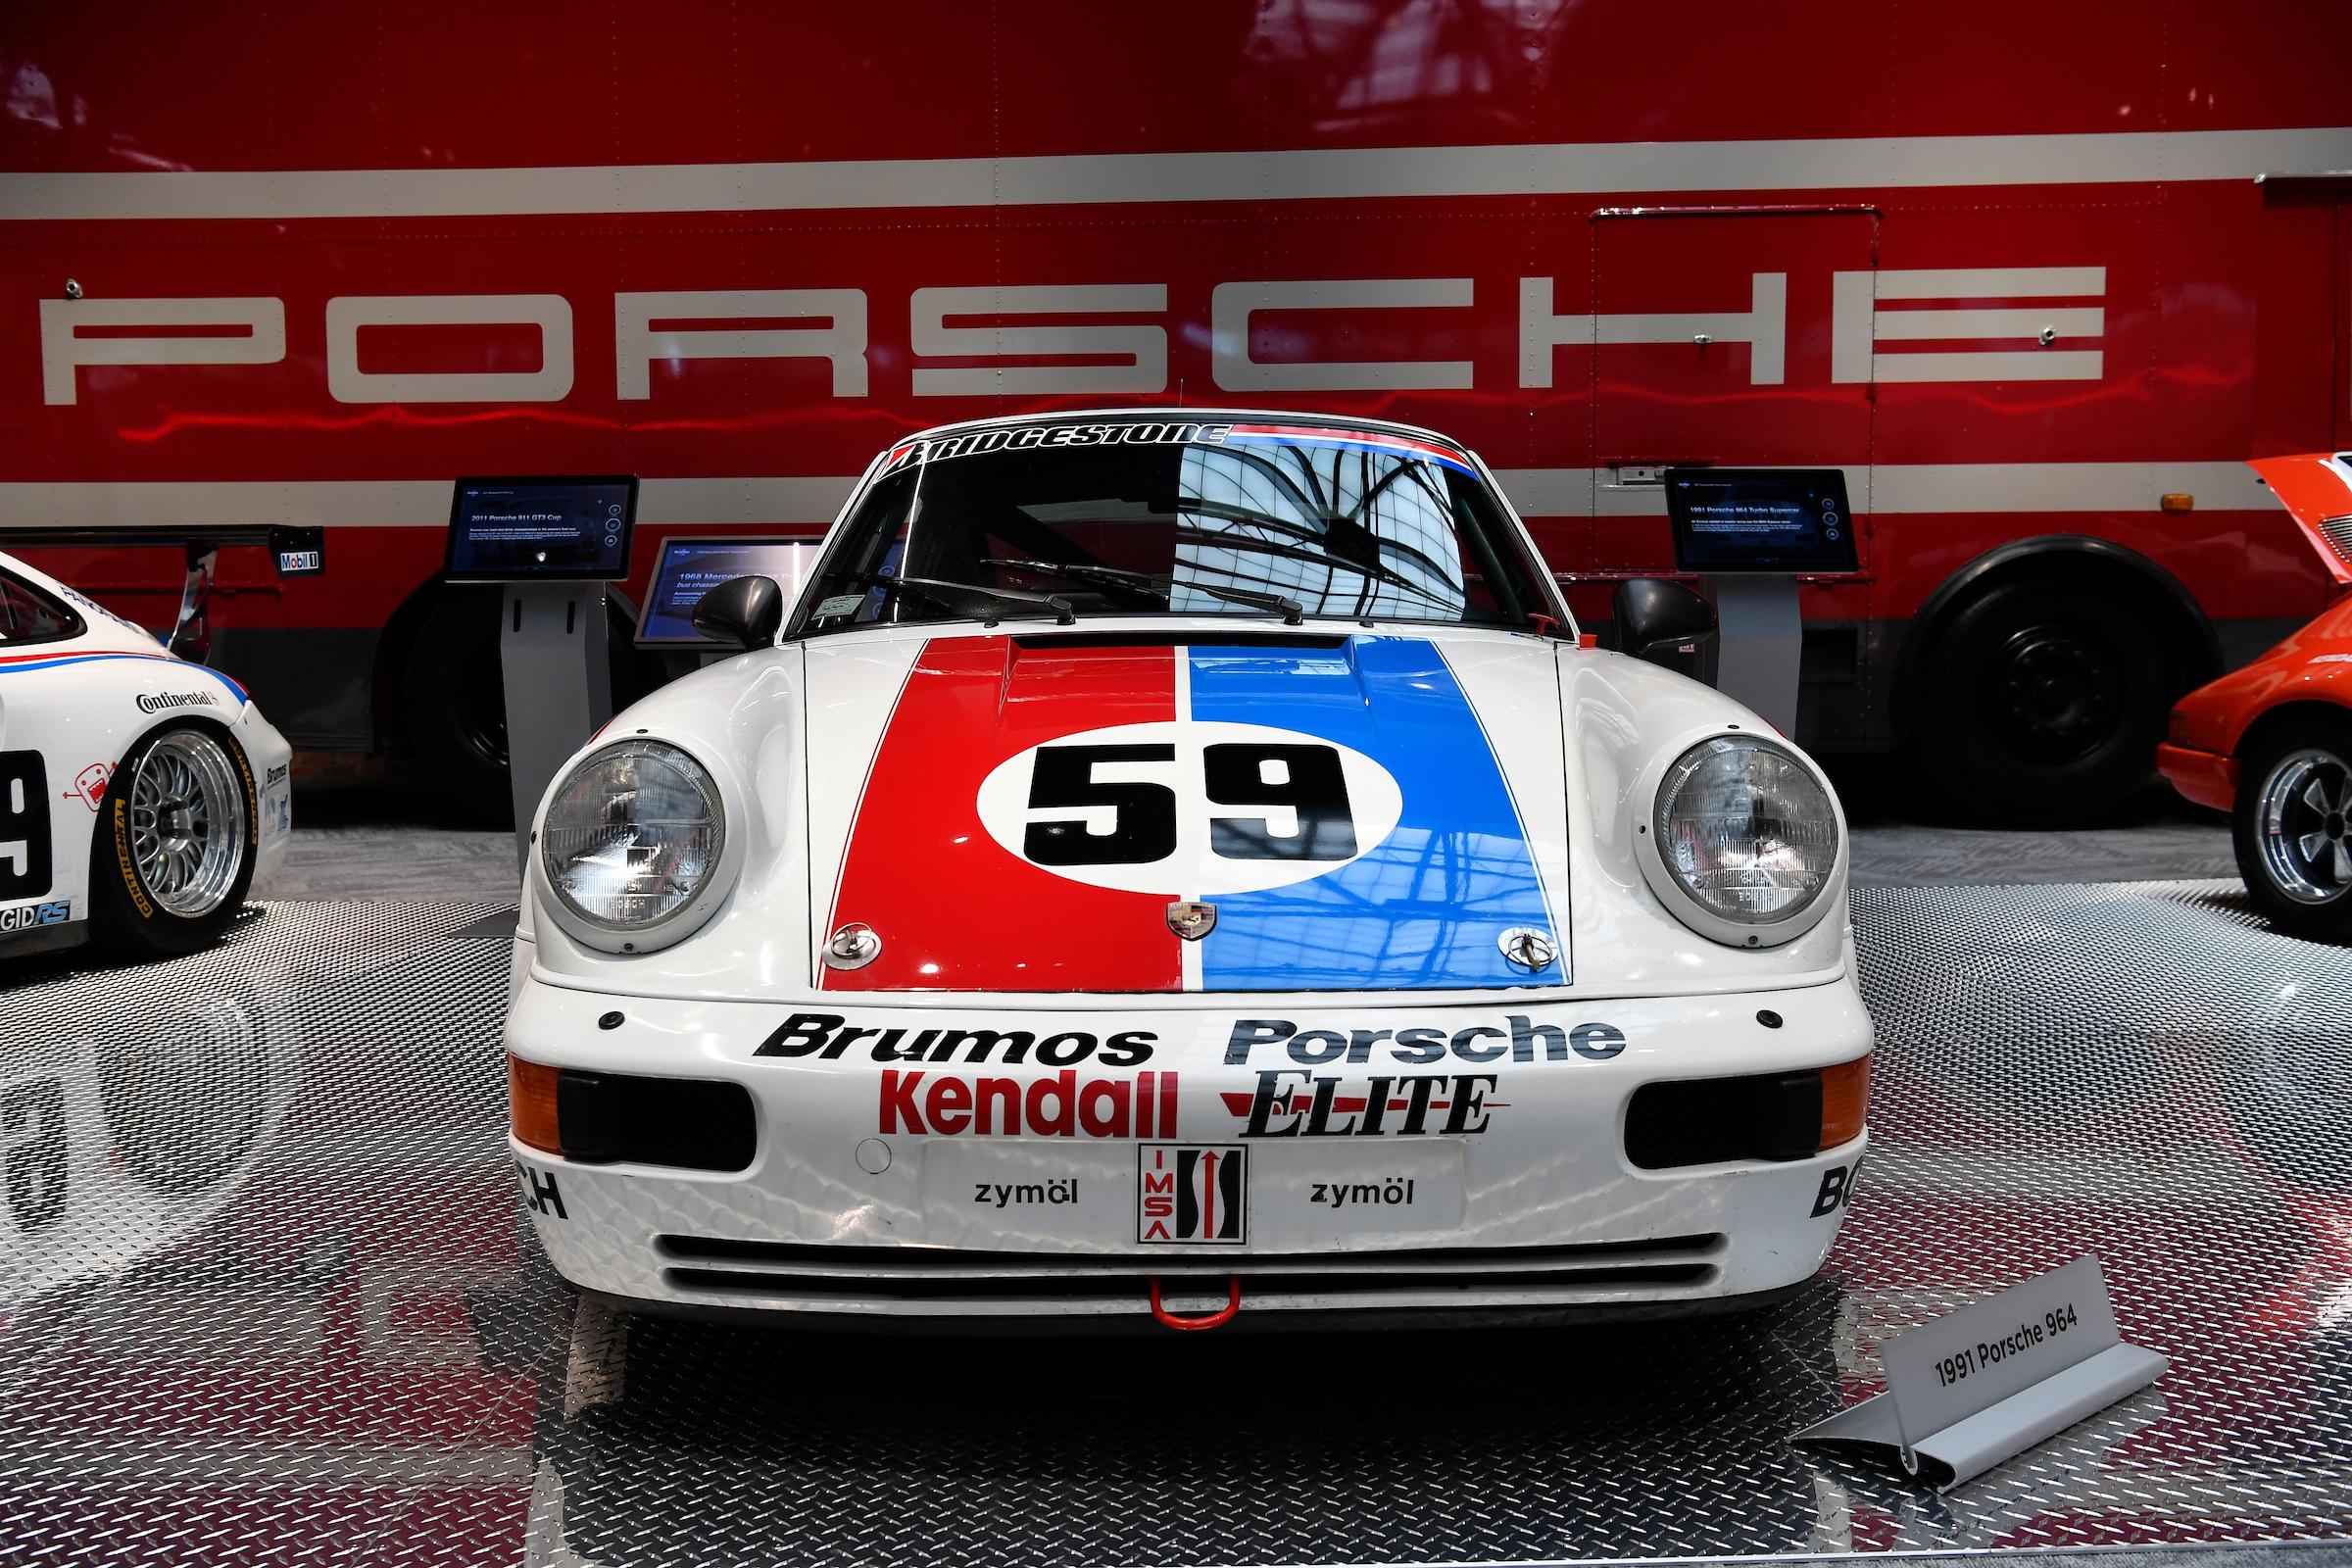 Brumos Collection 1991 Porsche 964